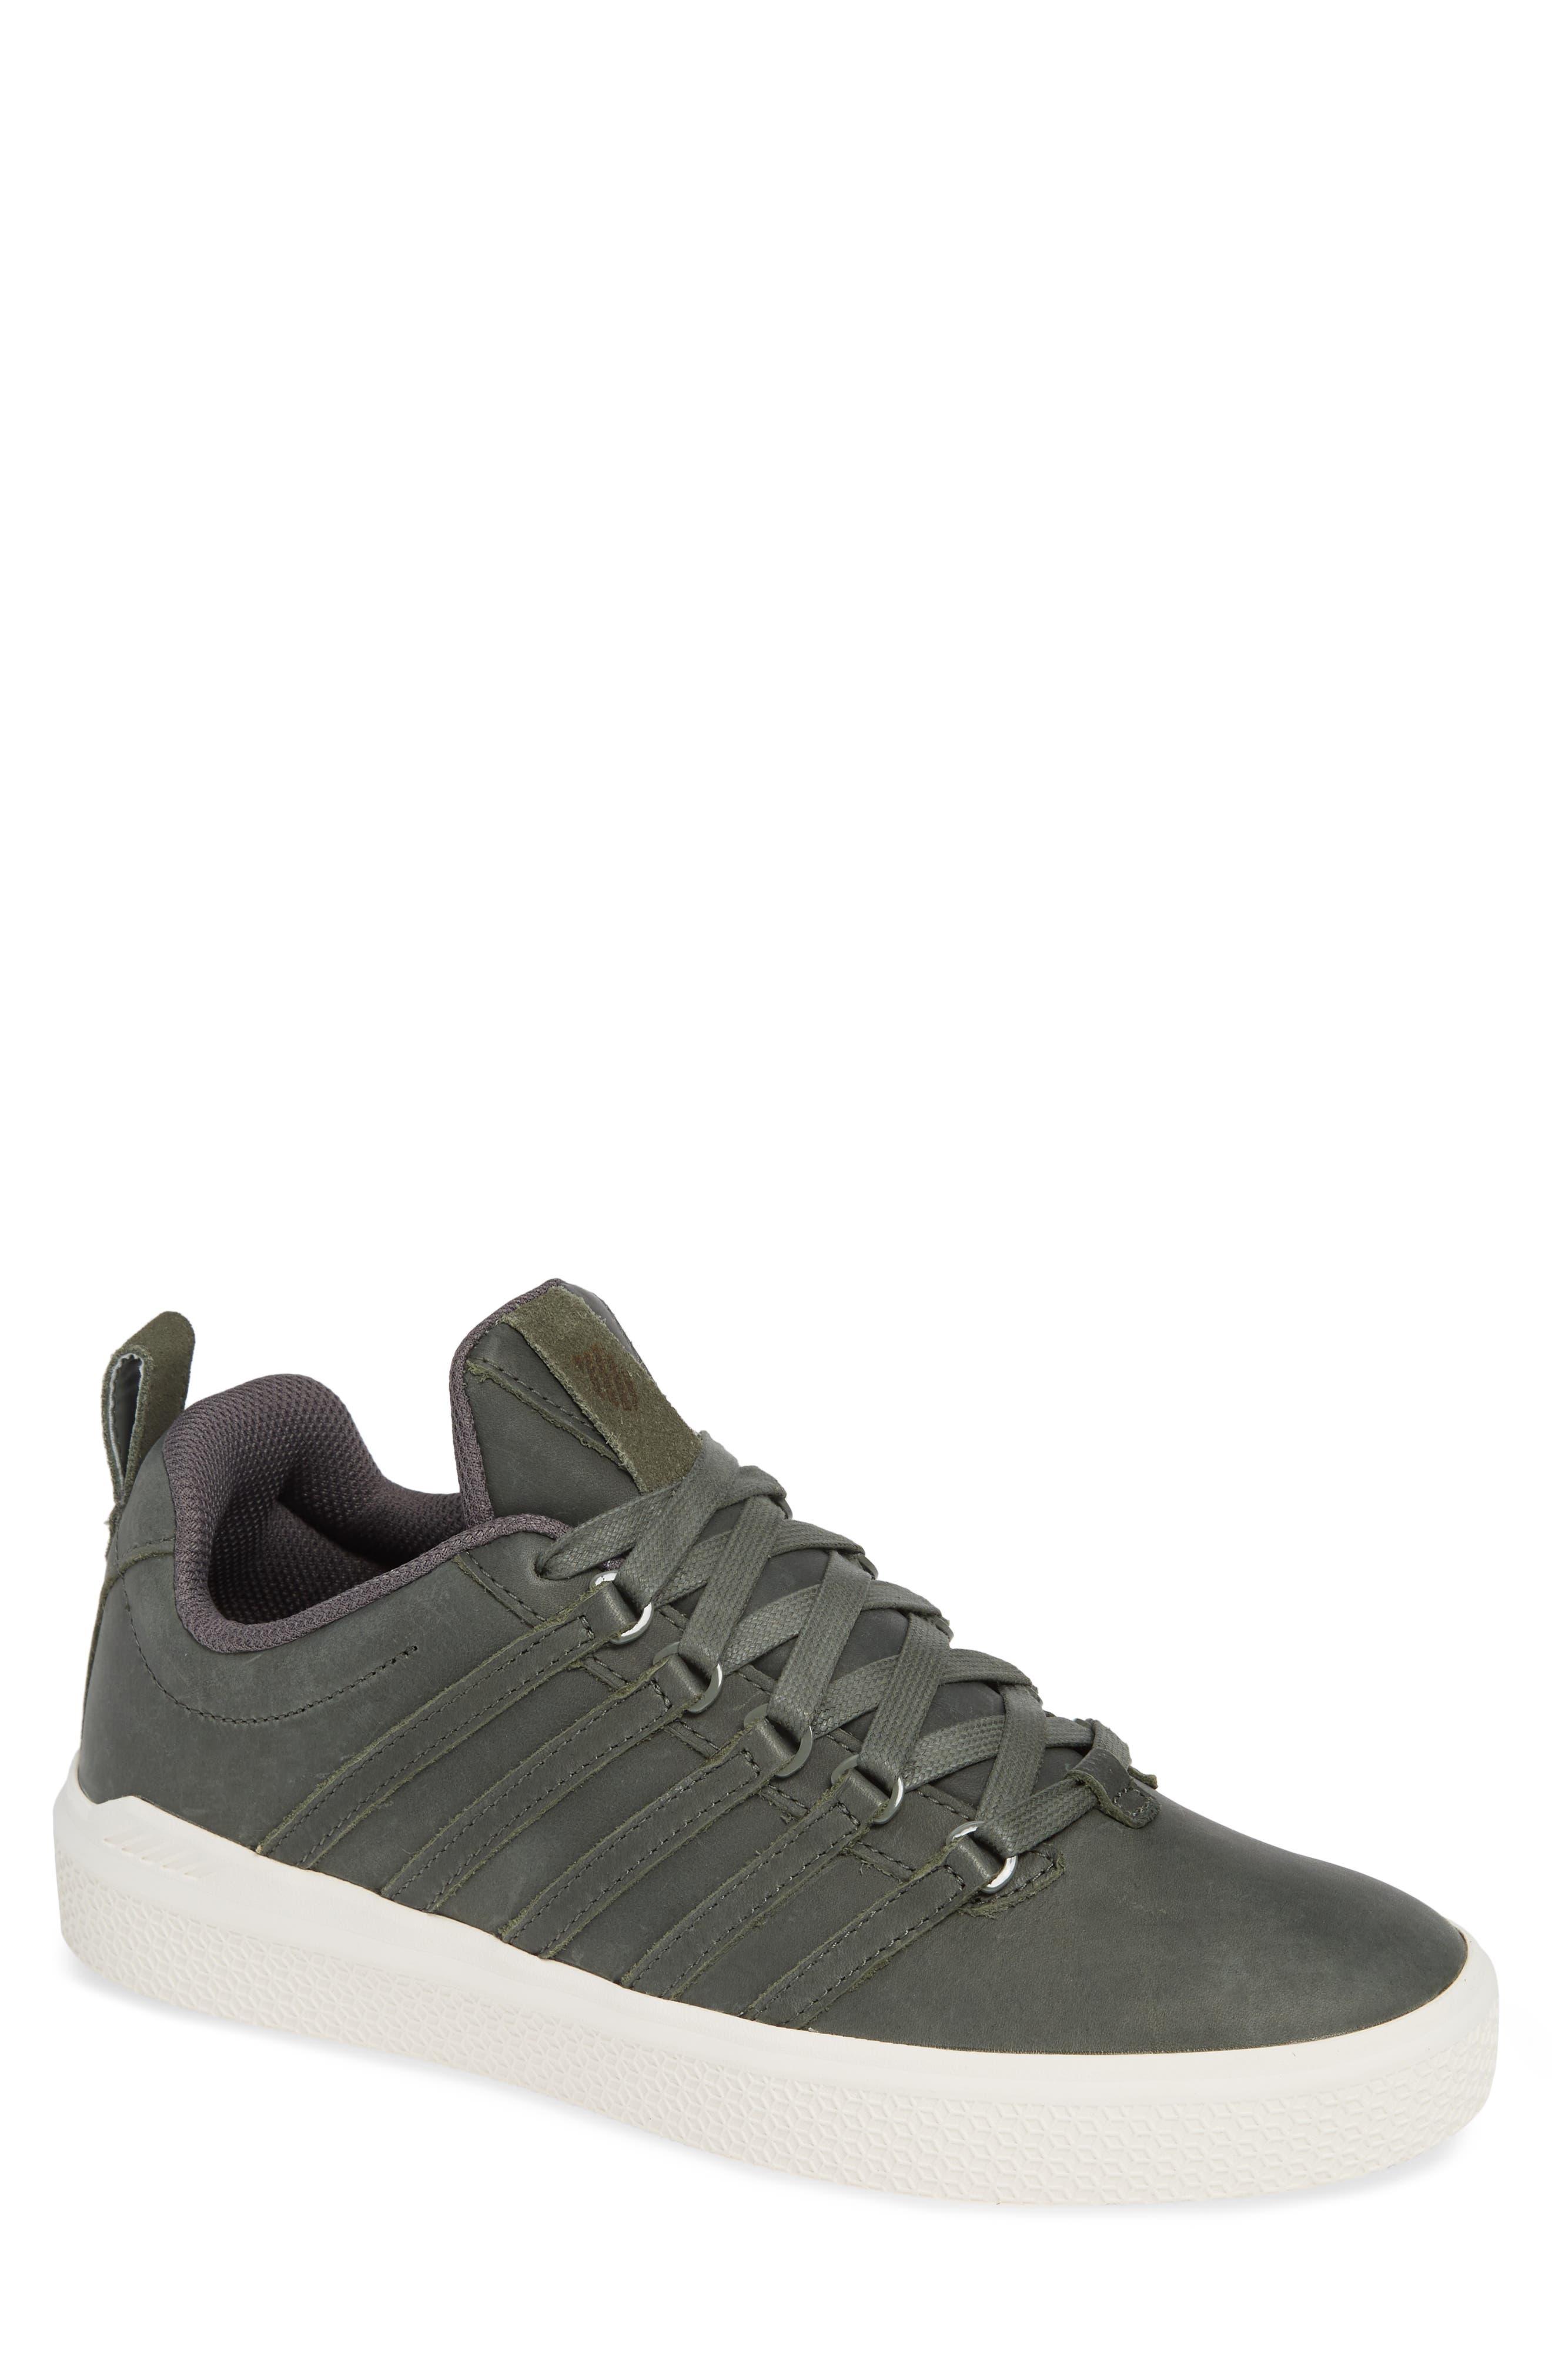 K-SWISS Donovan Sneaker in Agave Green/ Charcoal